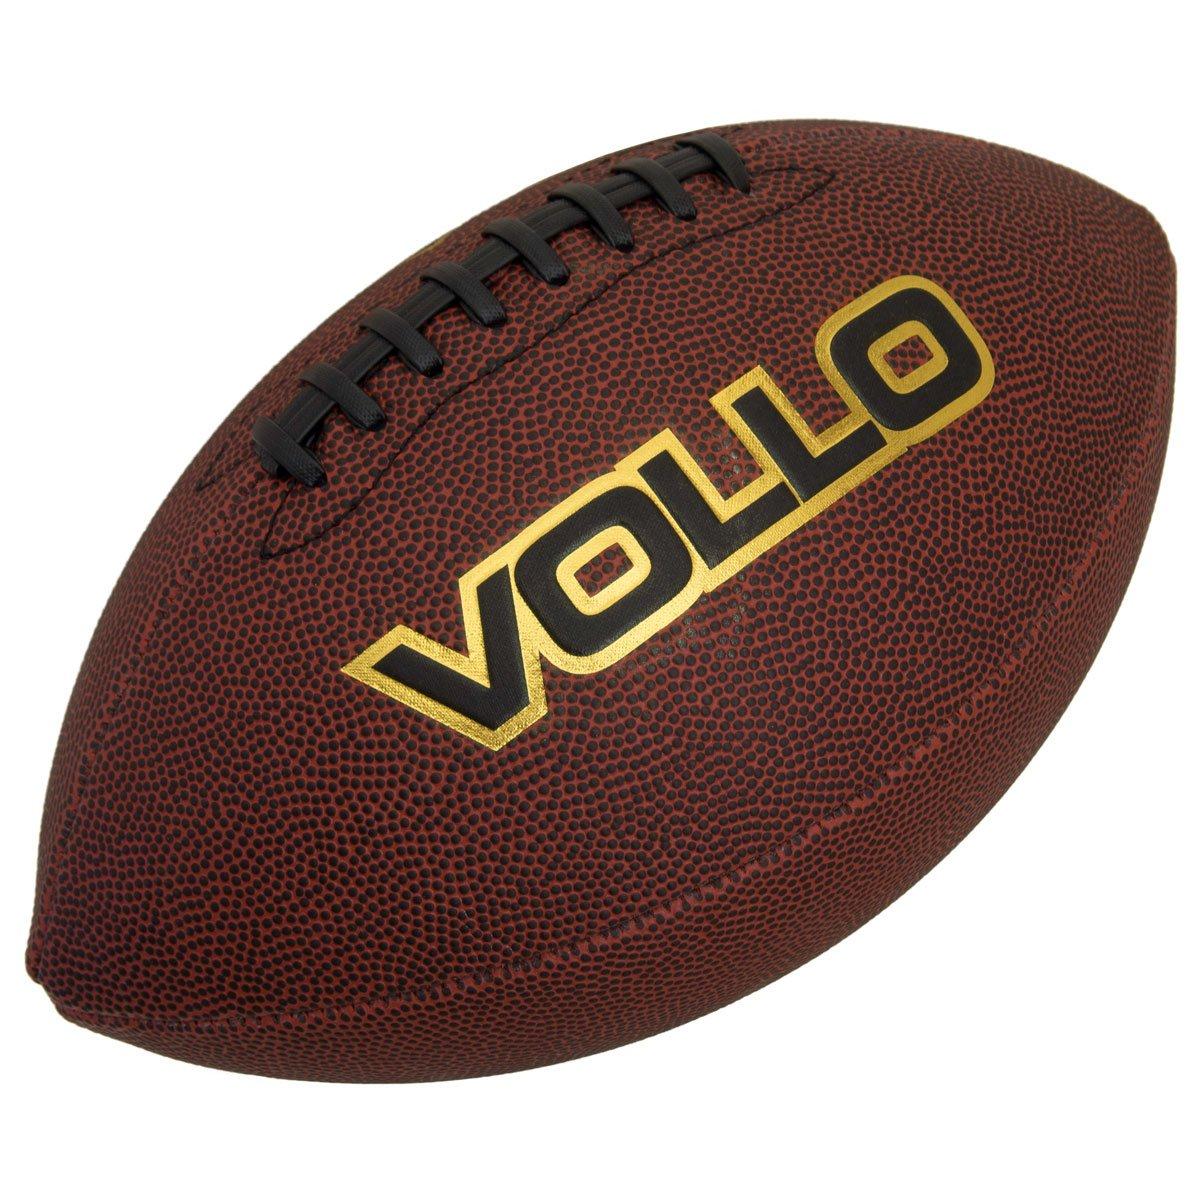 Bola Vollo Sports De Futebol Americano Tamanho Oficial 9 - Marrom ... d16da7978224e